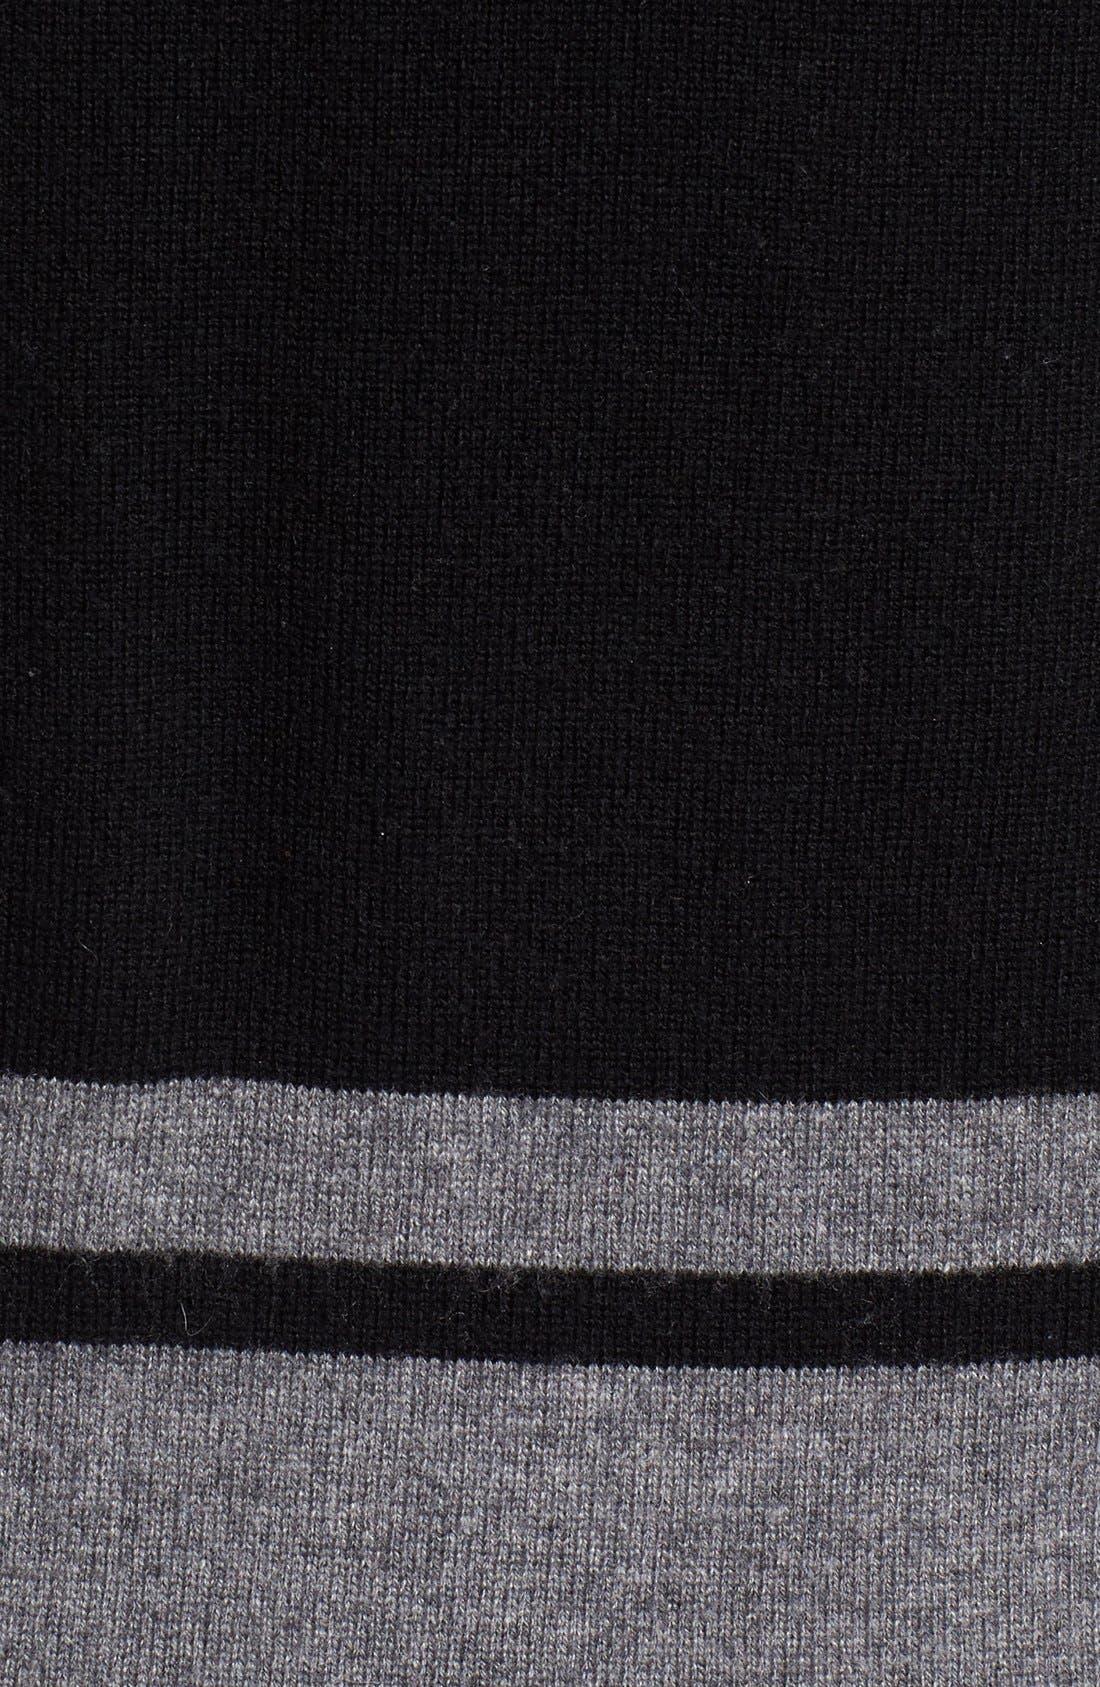 Stripe Wool Blend Sweater,                             Alternate thumbnail 10, color,